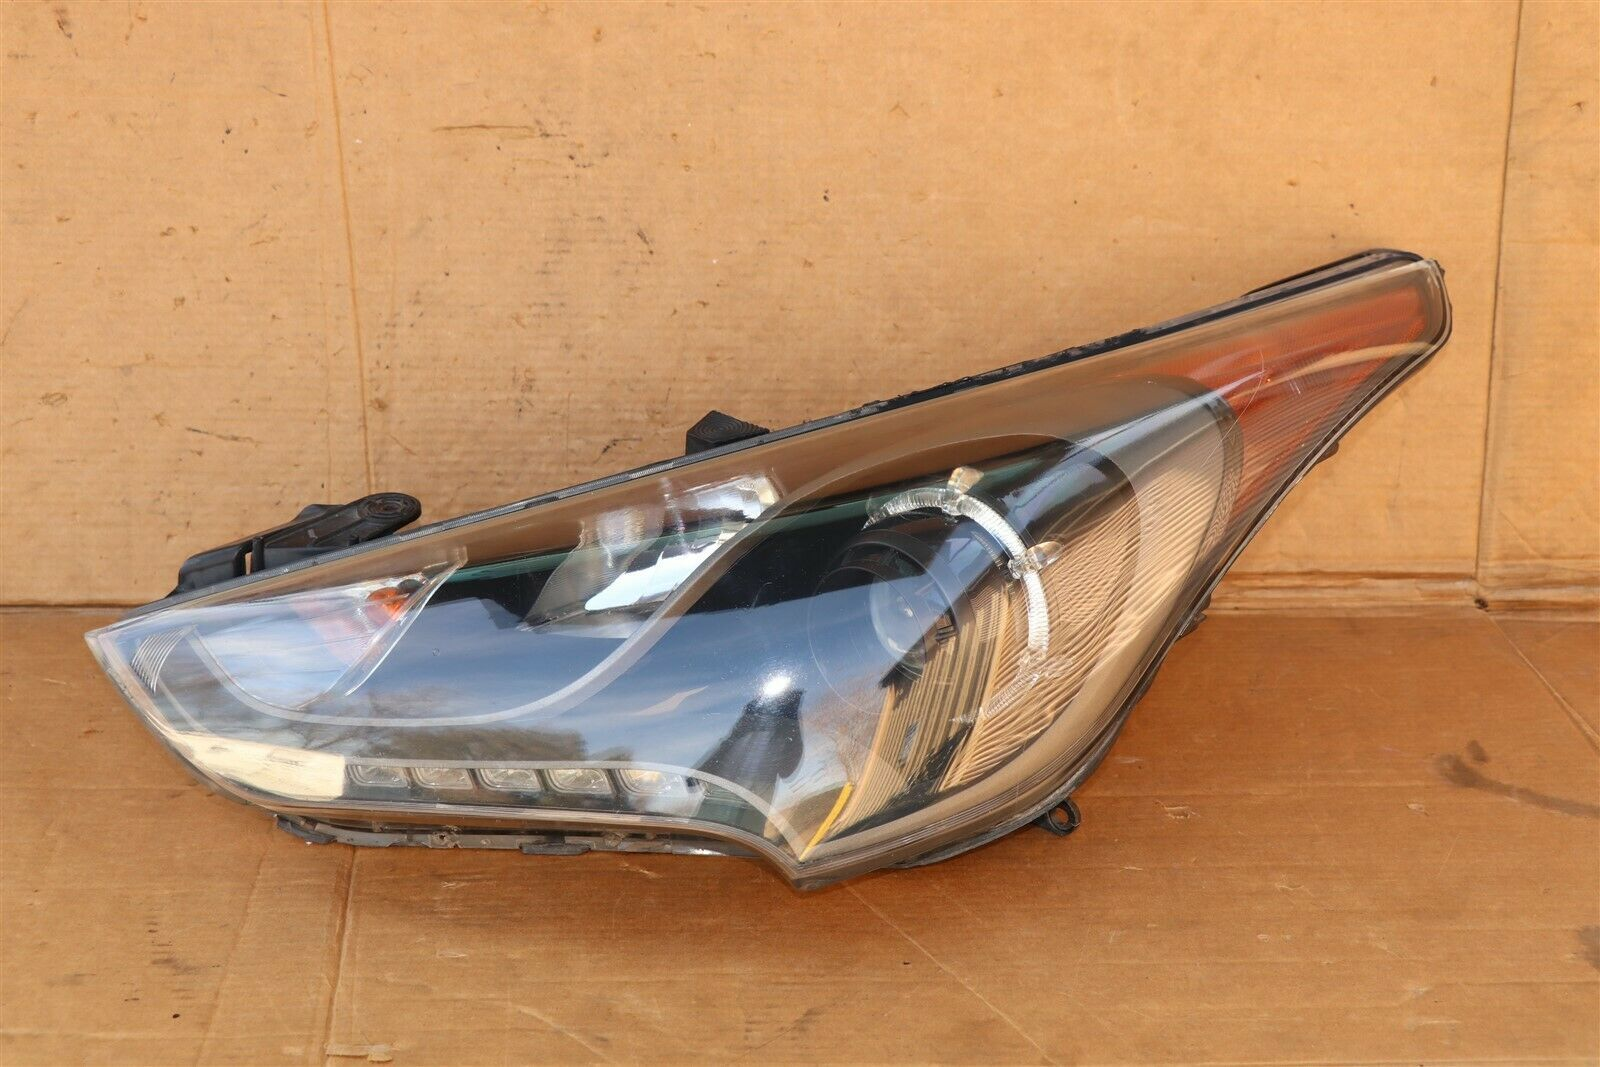 13-16 Hyundai Veloster Turbo Projector Headlight Lamp W/LED Driver Left LH